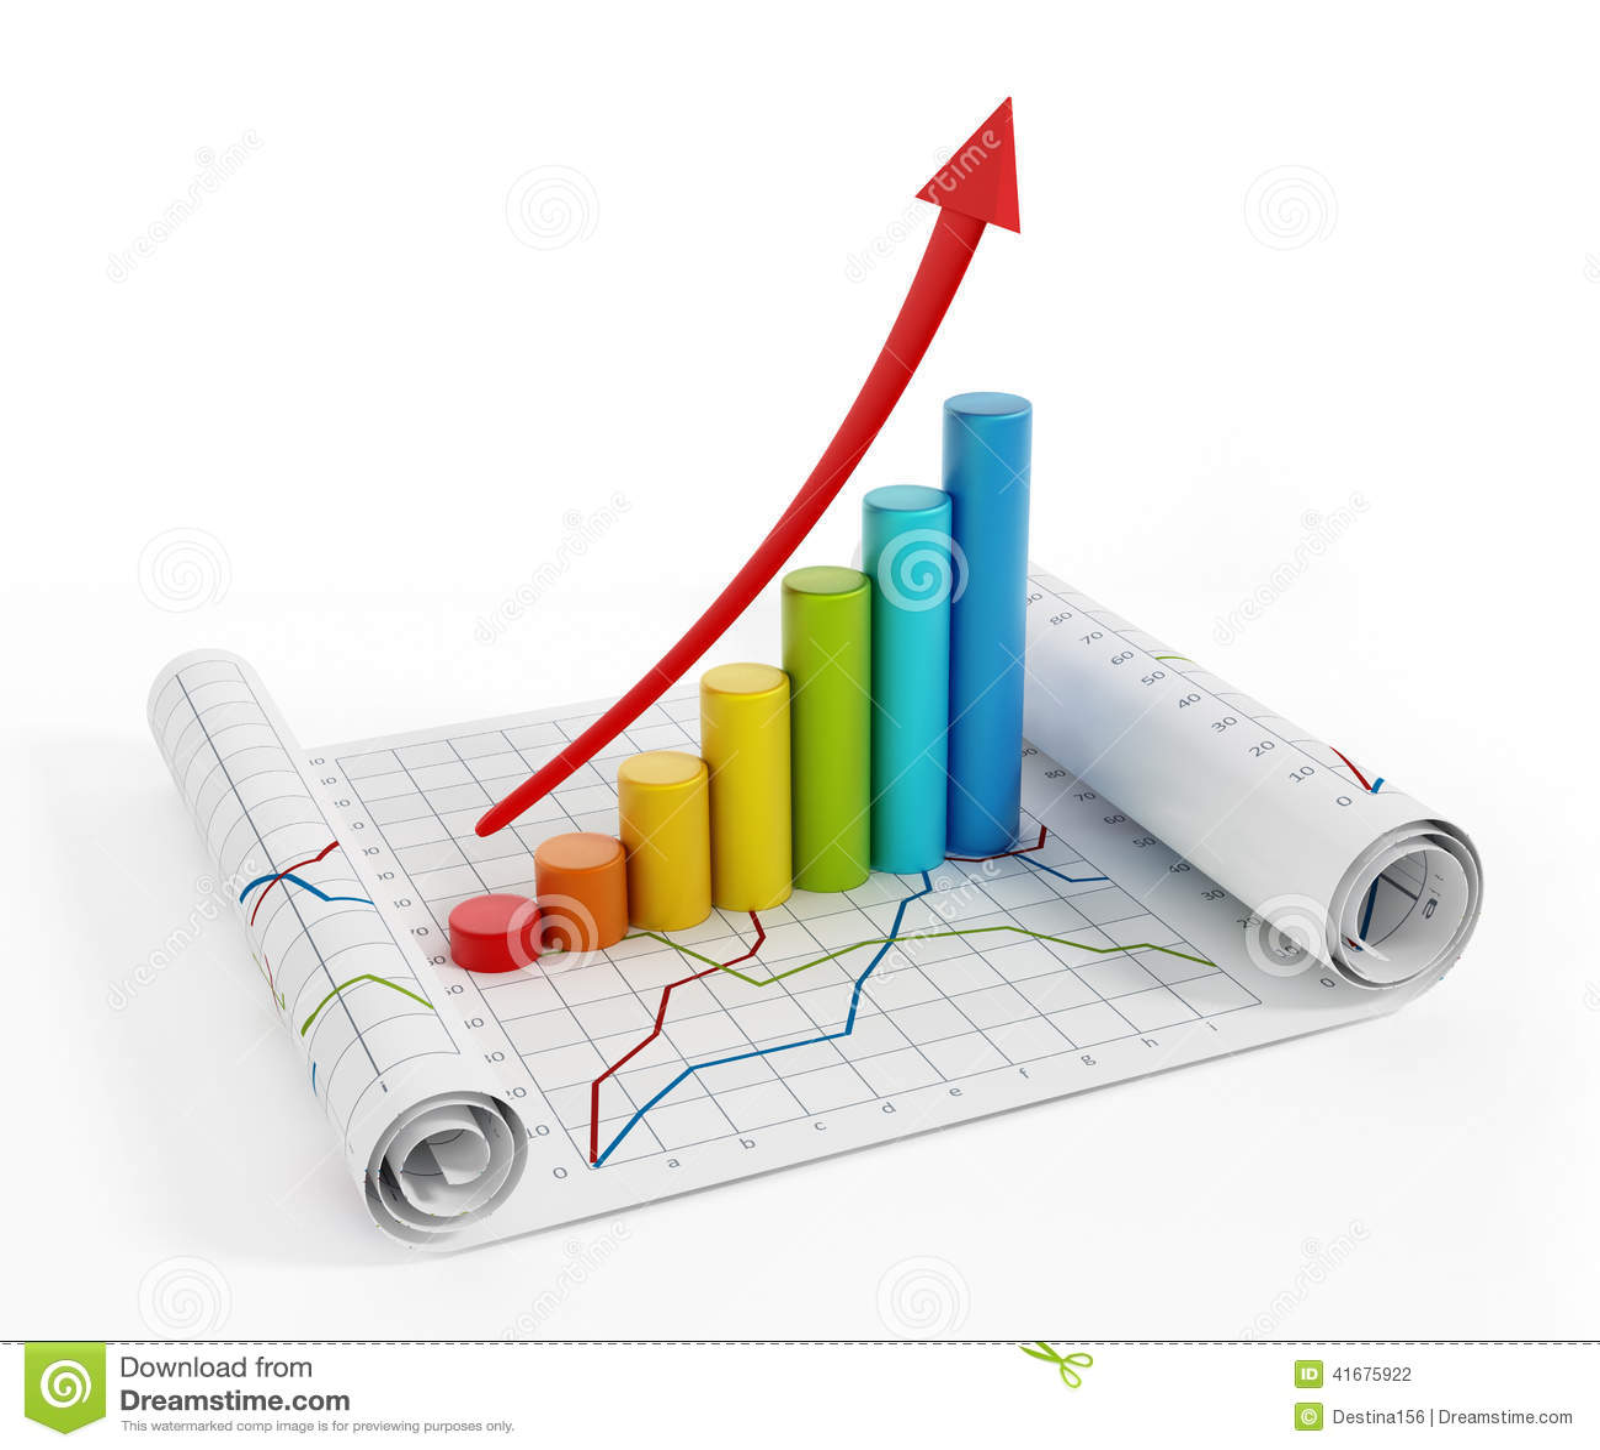 Financial Graphics Stock Photo - Image: 41675922